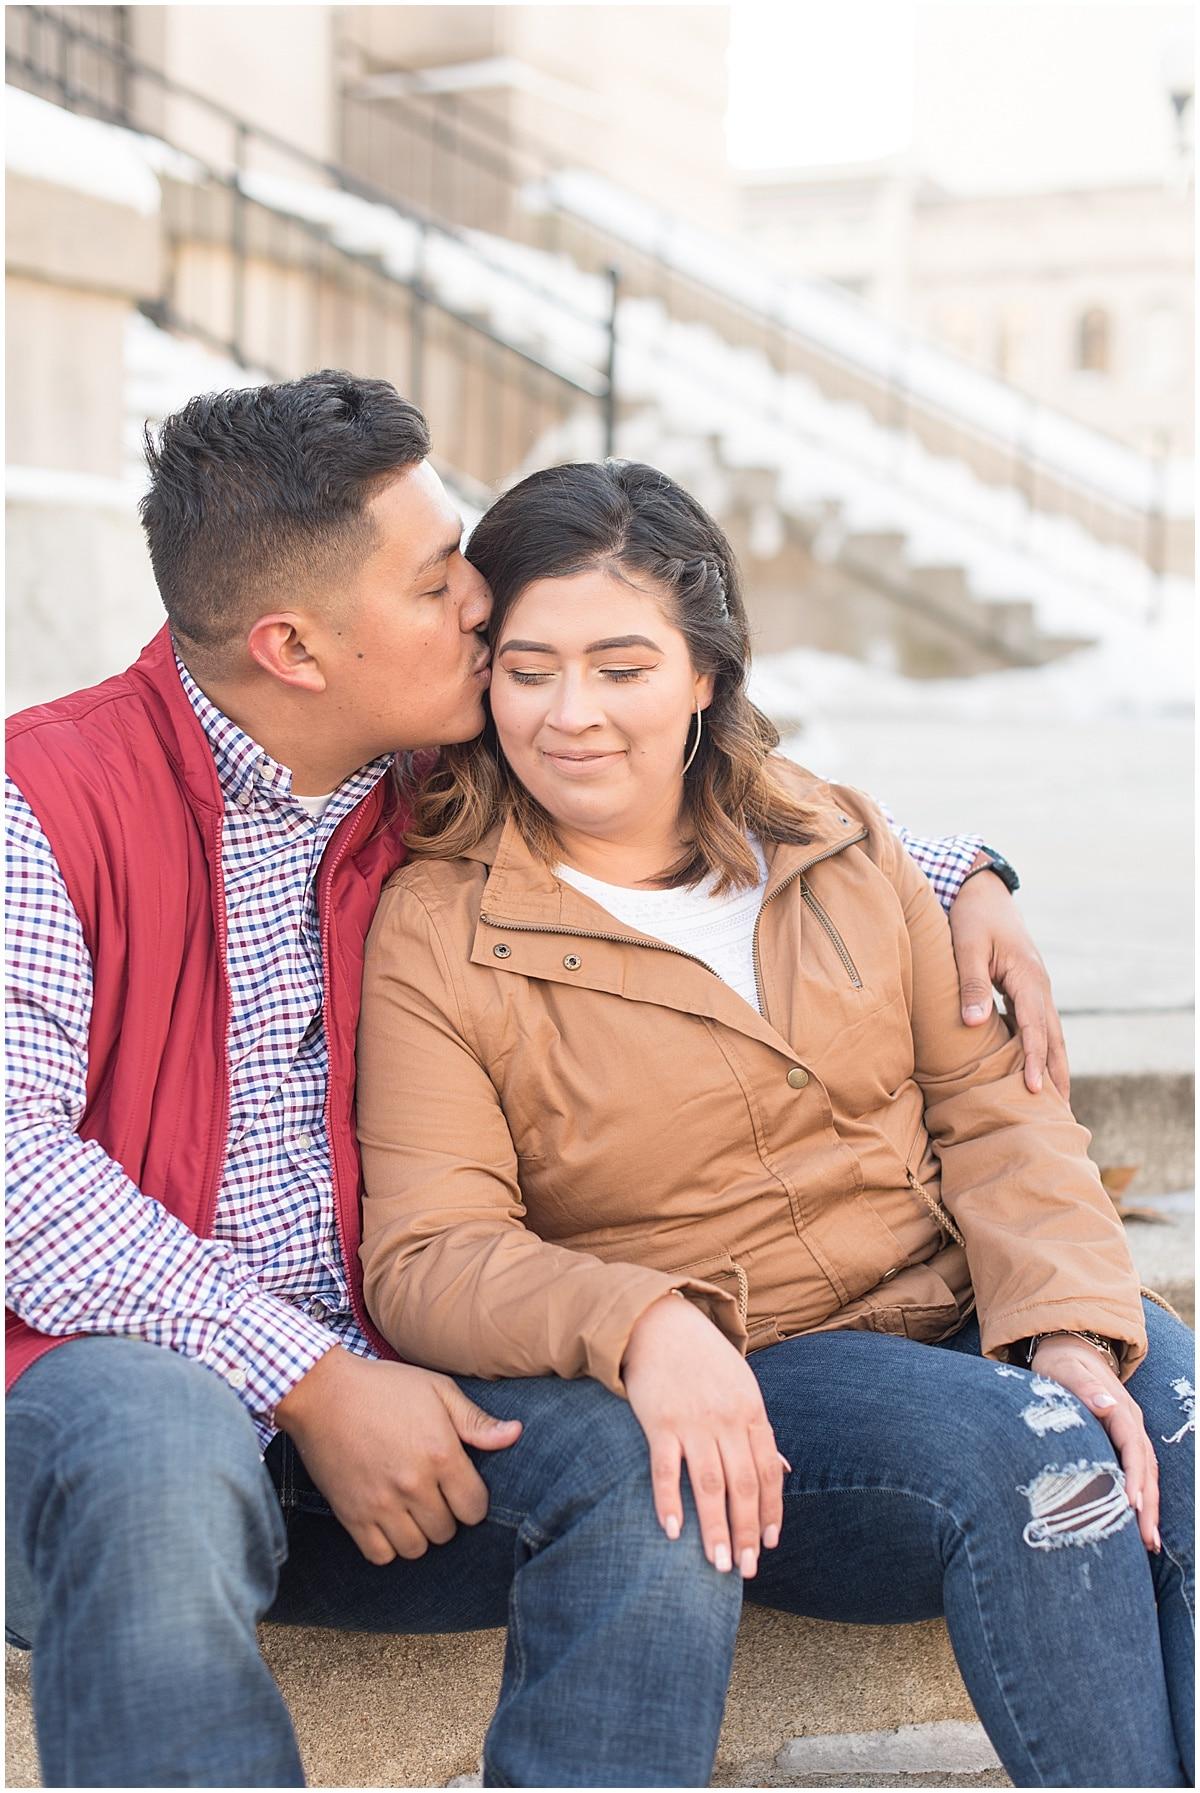 Jose & Carolina - Engagement Photos in Downtown Lafayette Indiana1.jpg